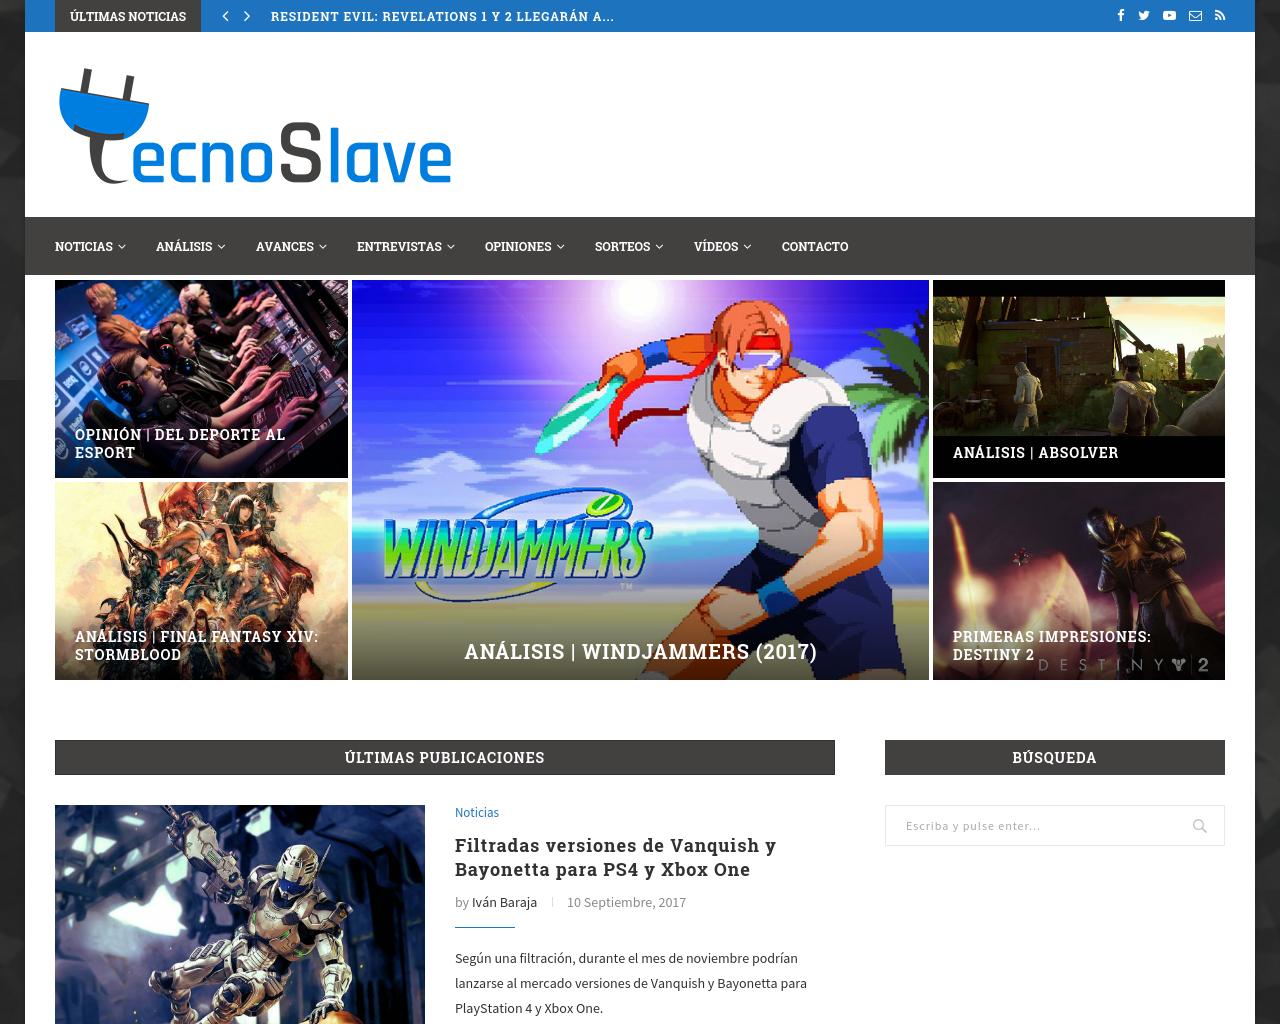 TecnoSlave-Advertising-Reviews-Pricing